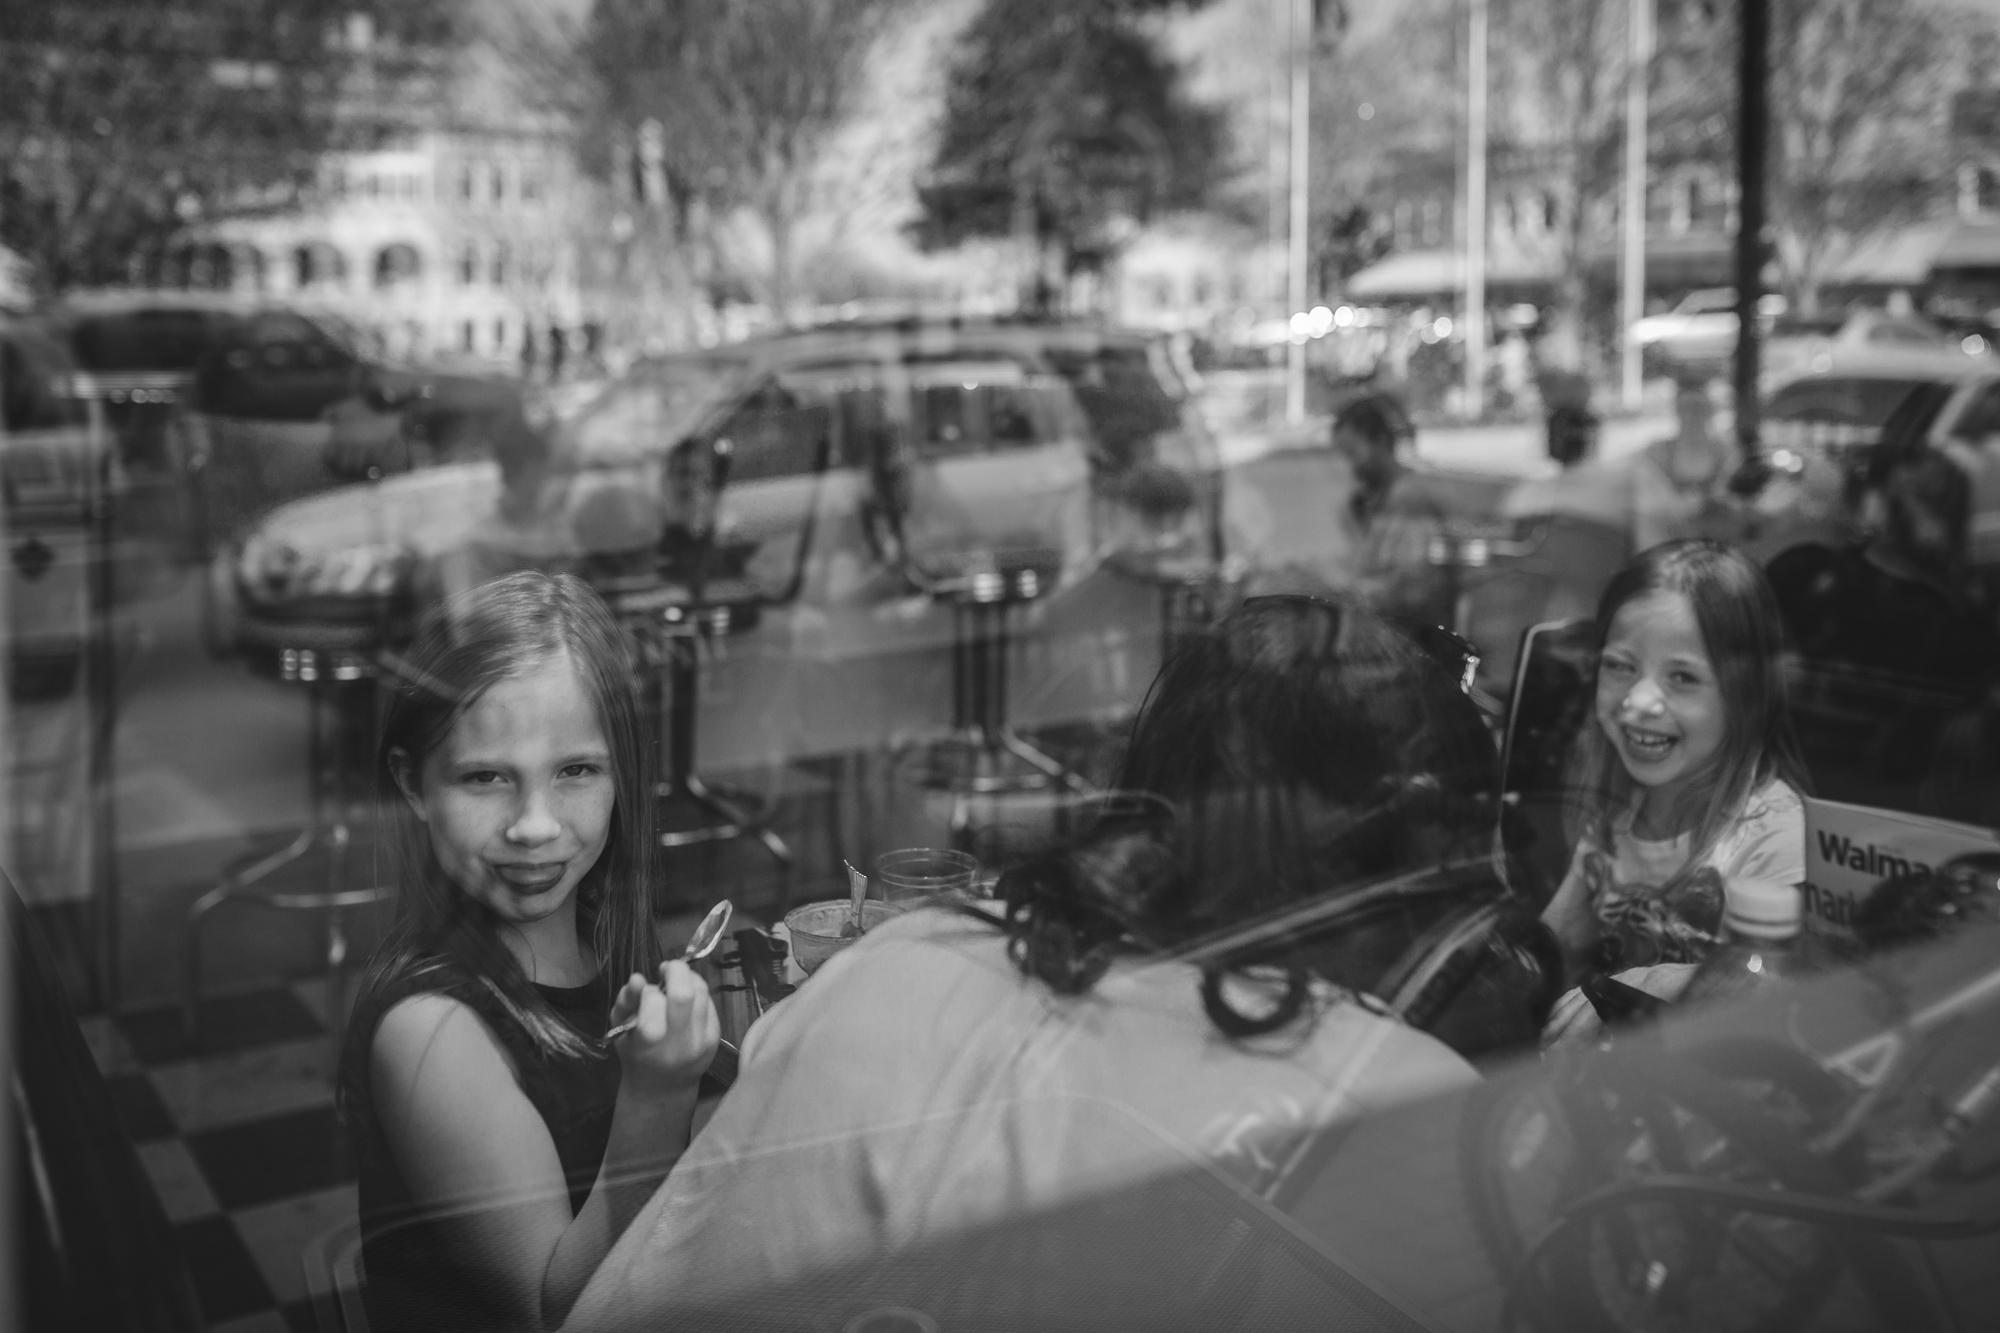 denver_colorado_documentary_lori_mack_photography20170408-4D5A5434.jpg